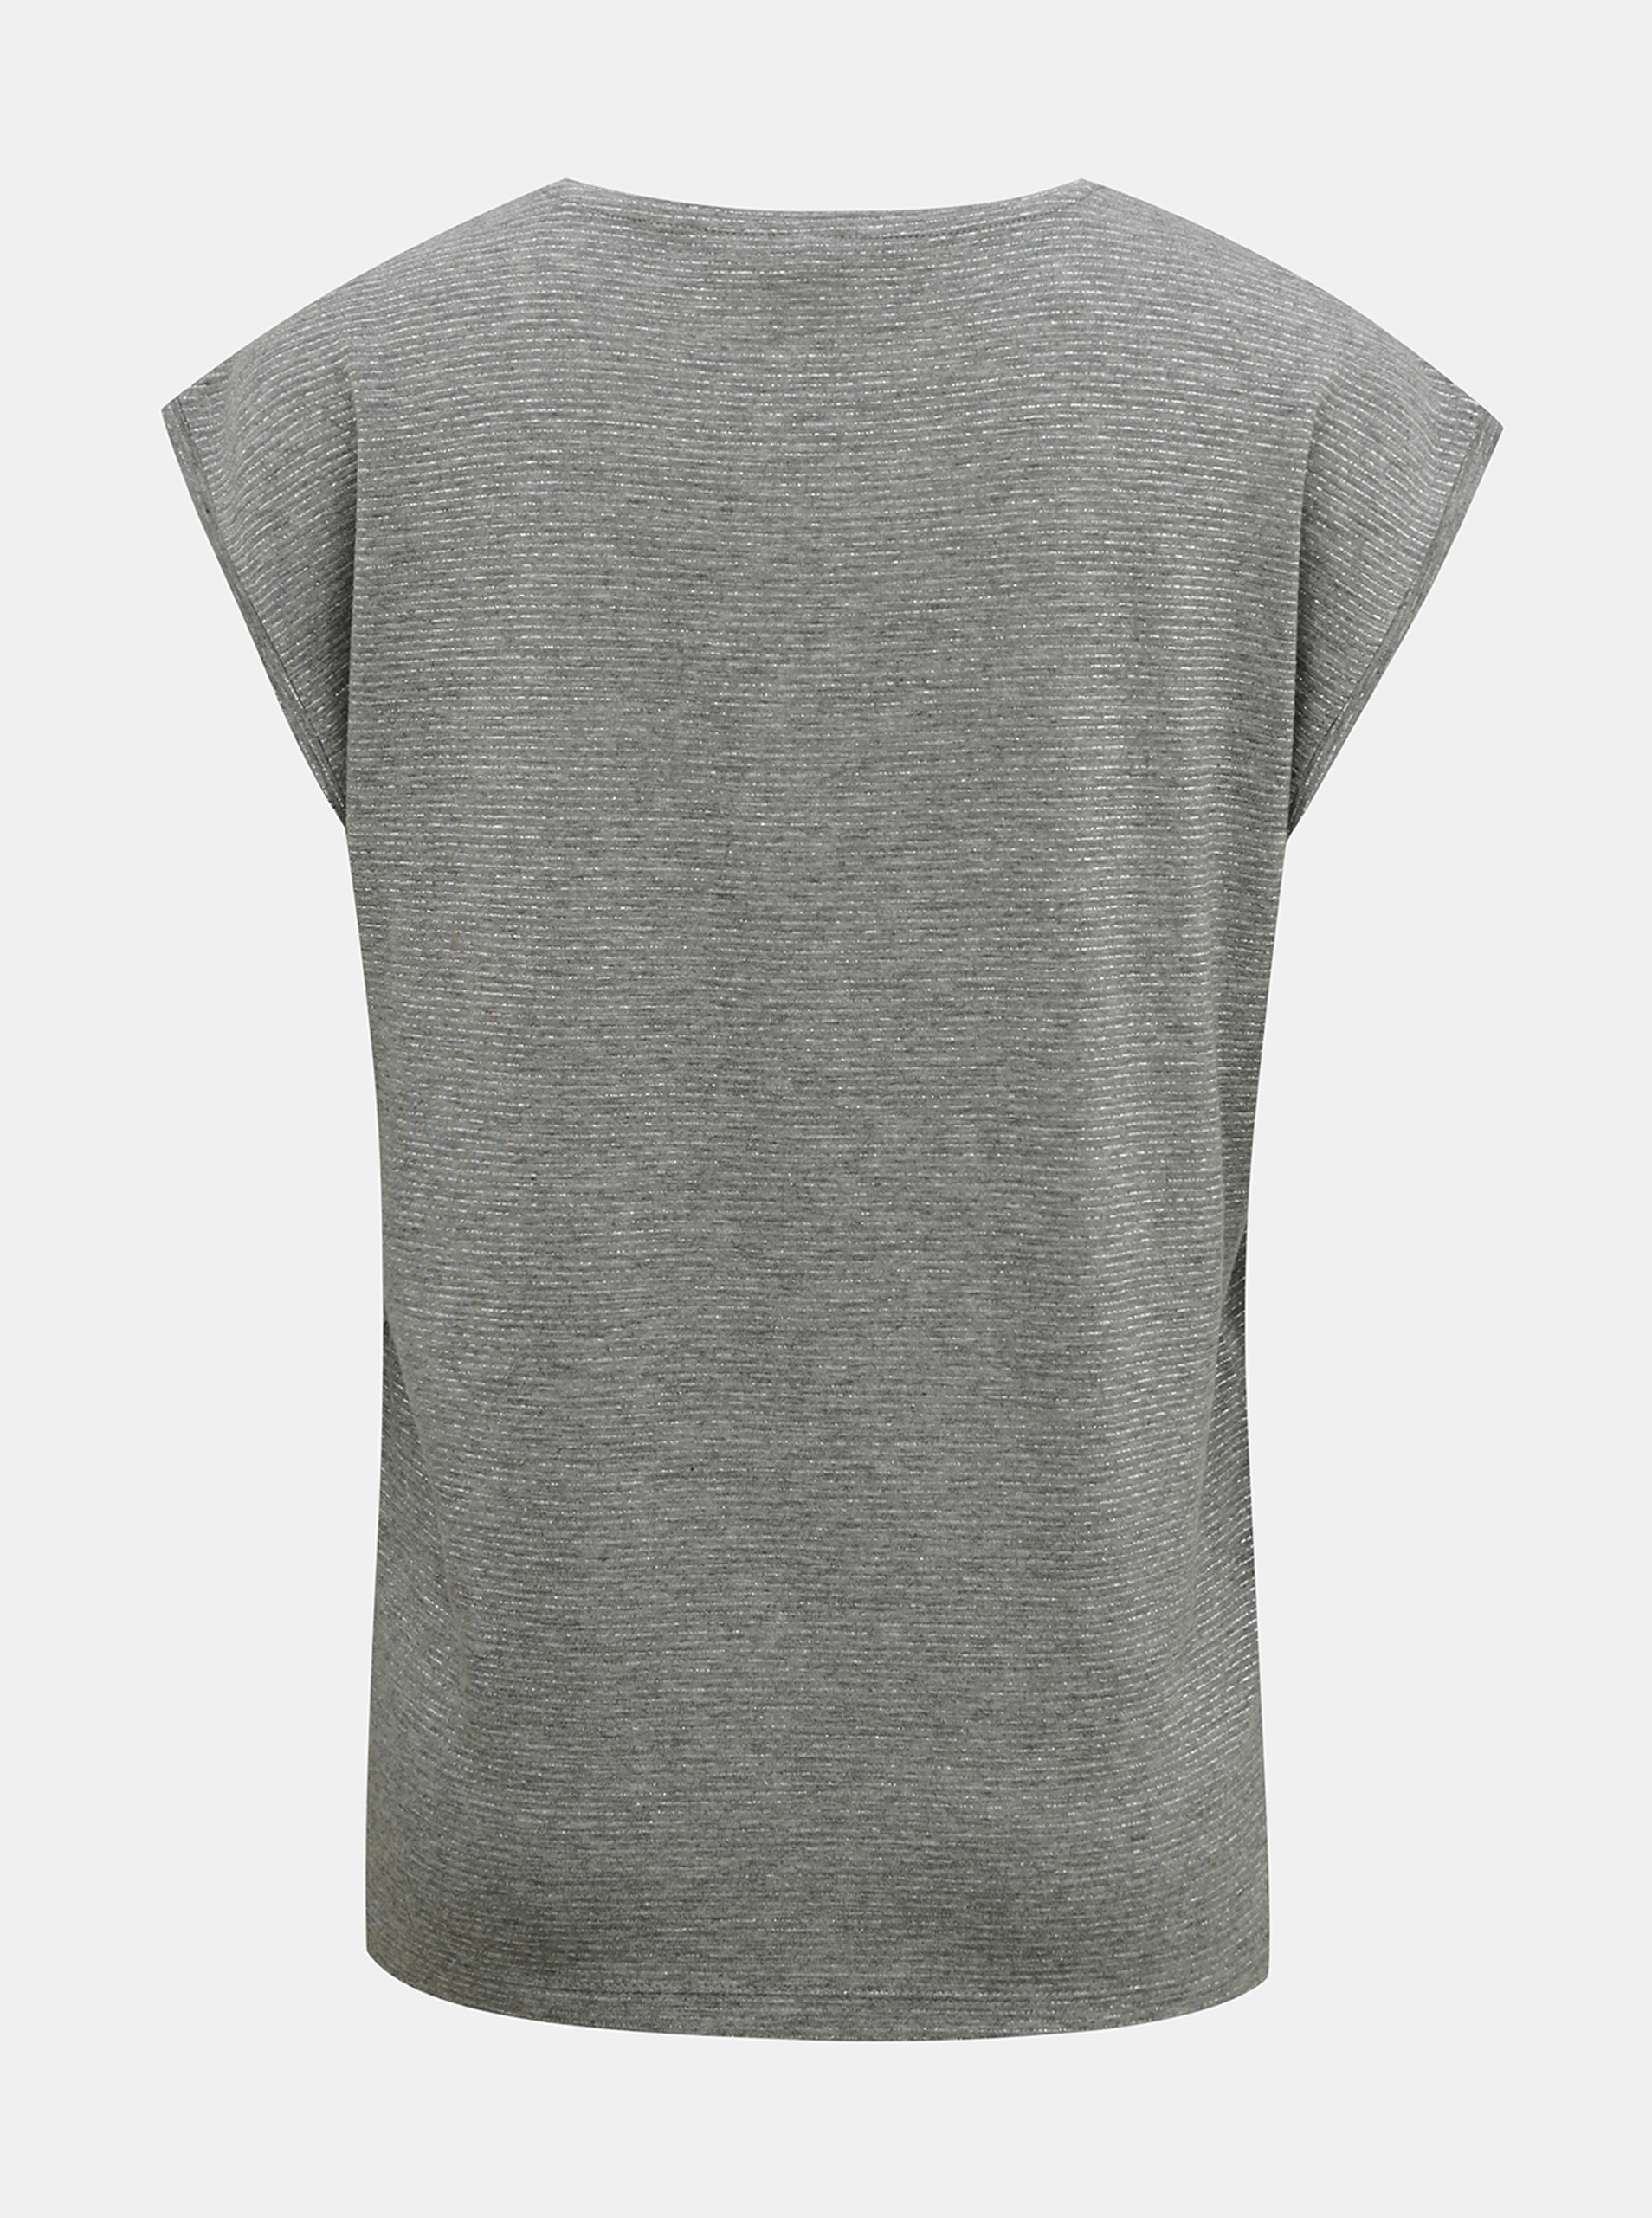 Šedé tričko s metalickými vlákny Pieces